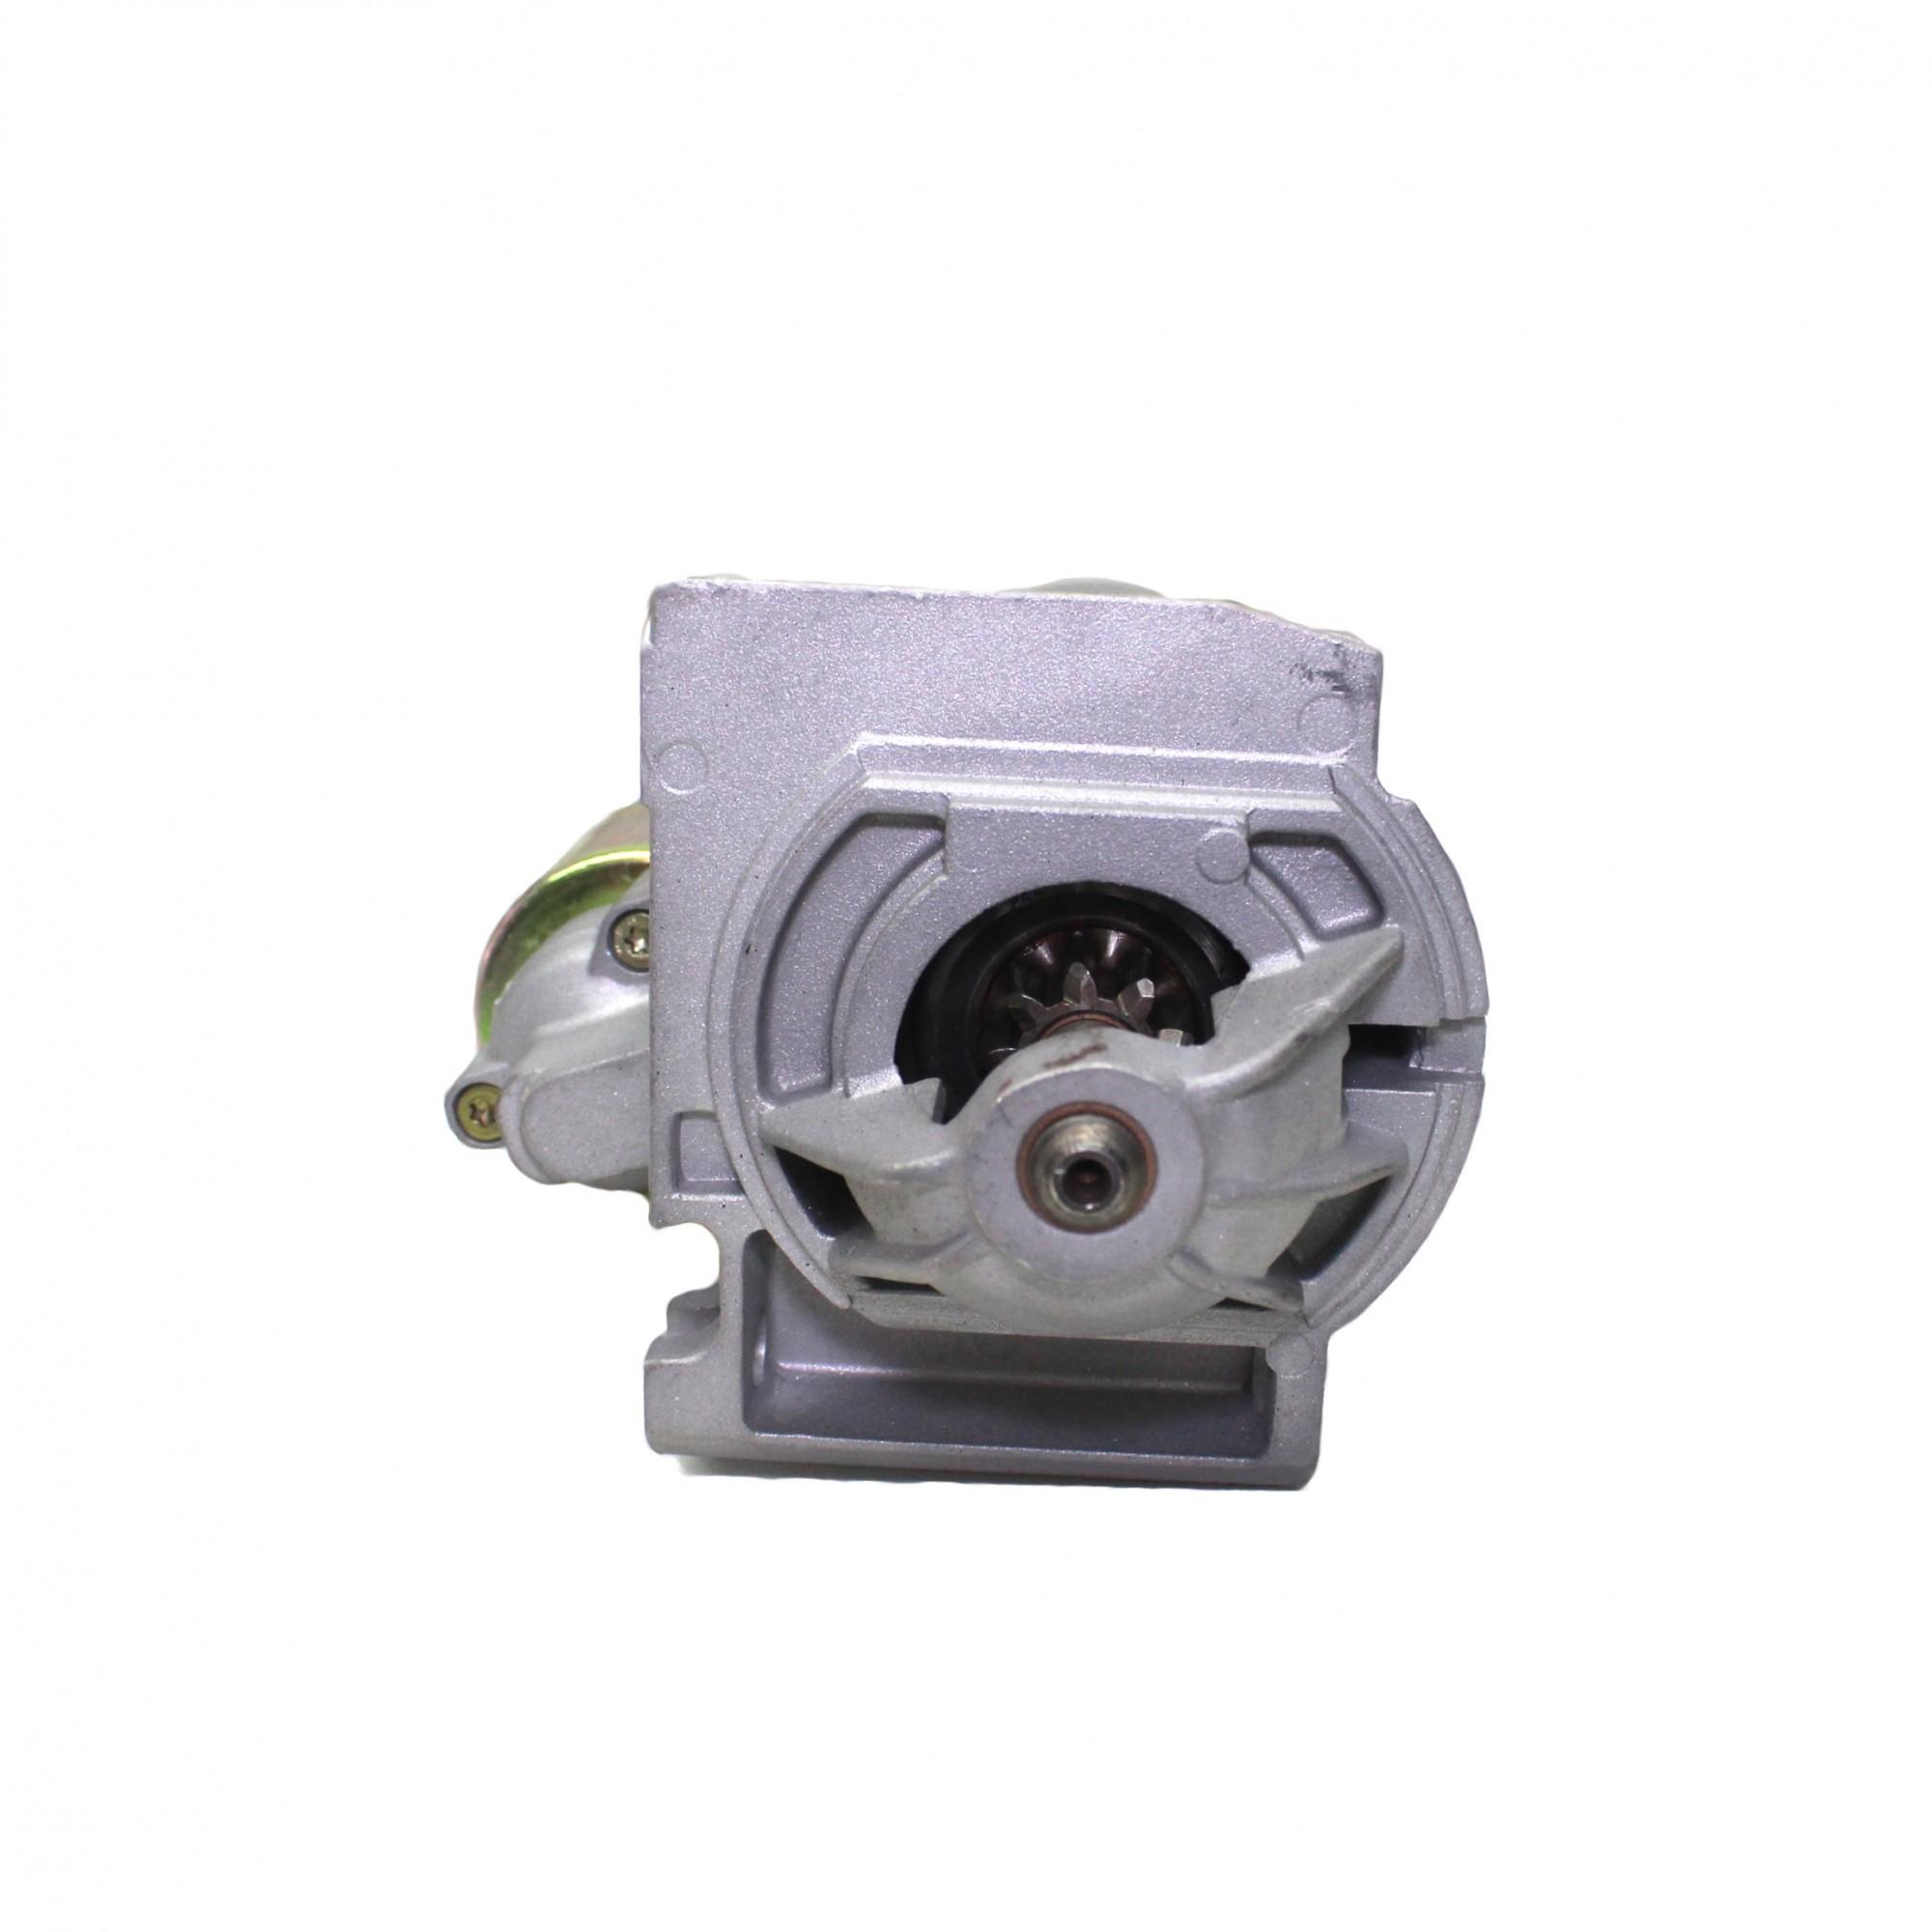 Motor de Arranque Partida Bosch Omega Australiano 99...03 92046275 / 9000061009